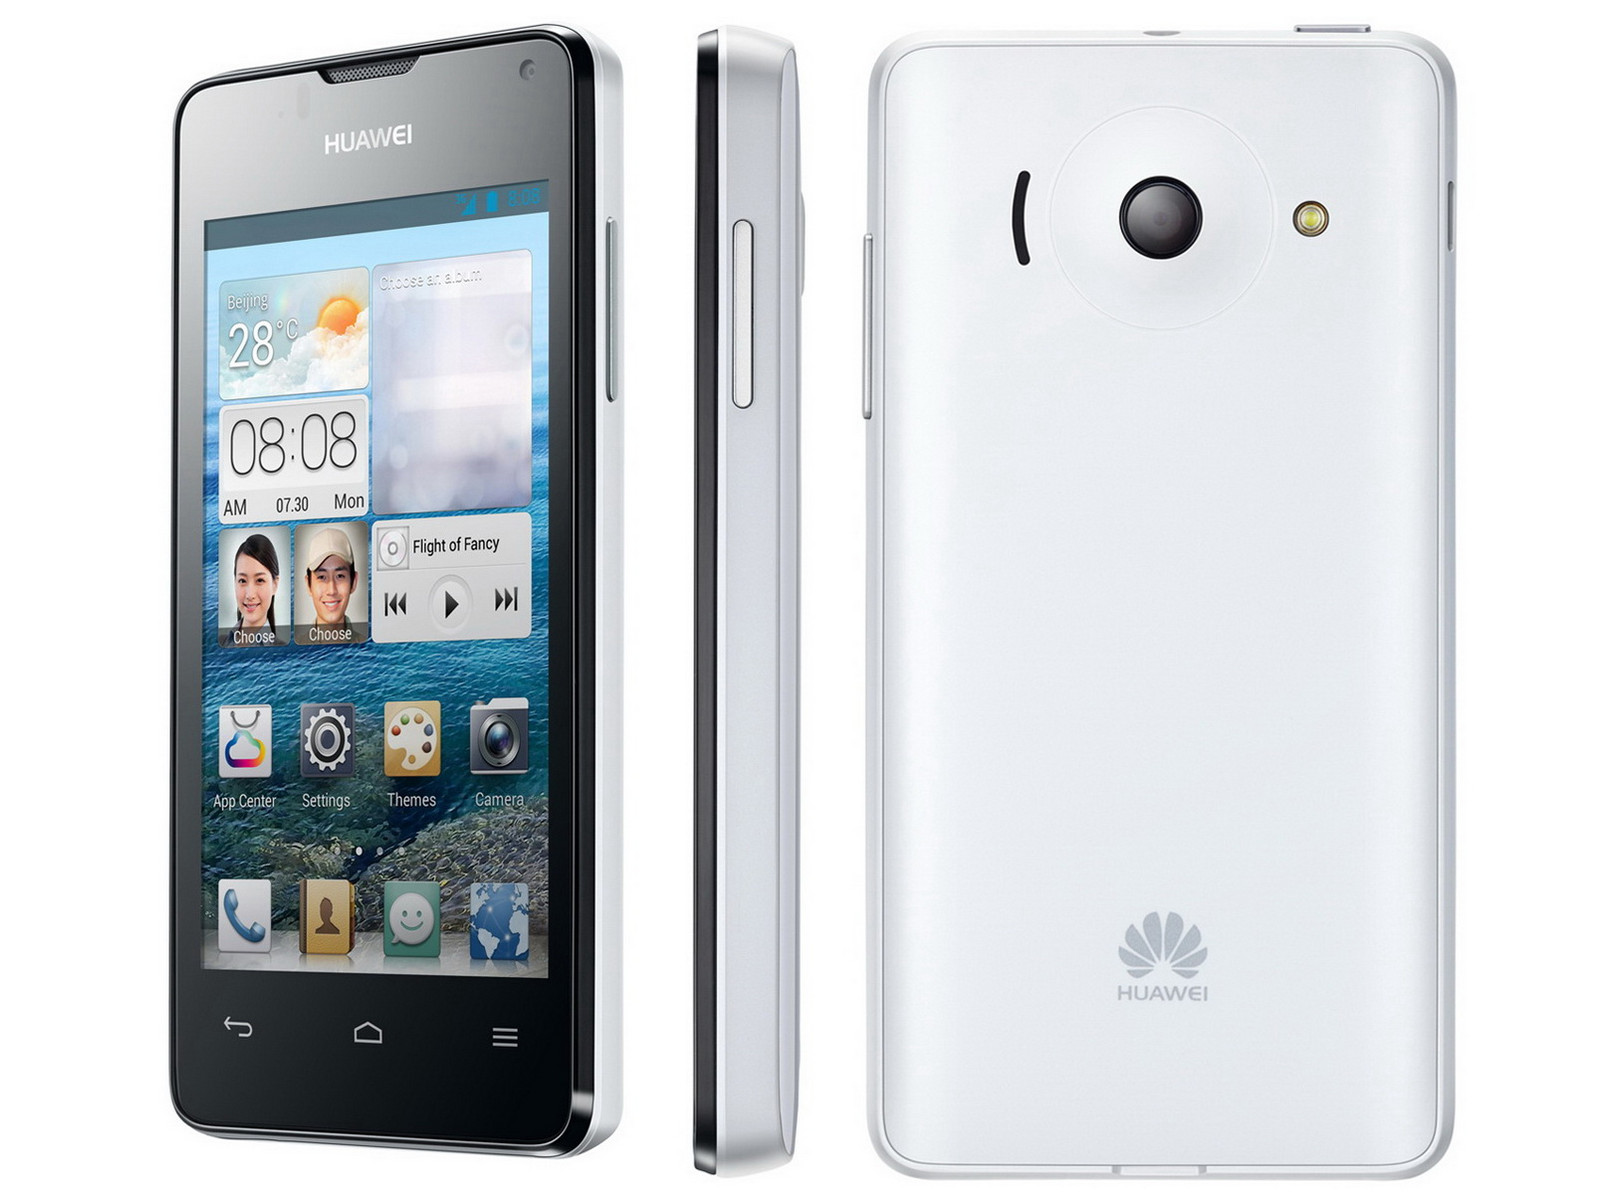 Huawei Smartphone Ascend Y300 Ab 2 April Für 121 Euro Bei O2